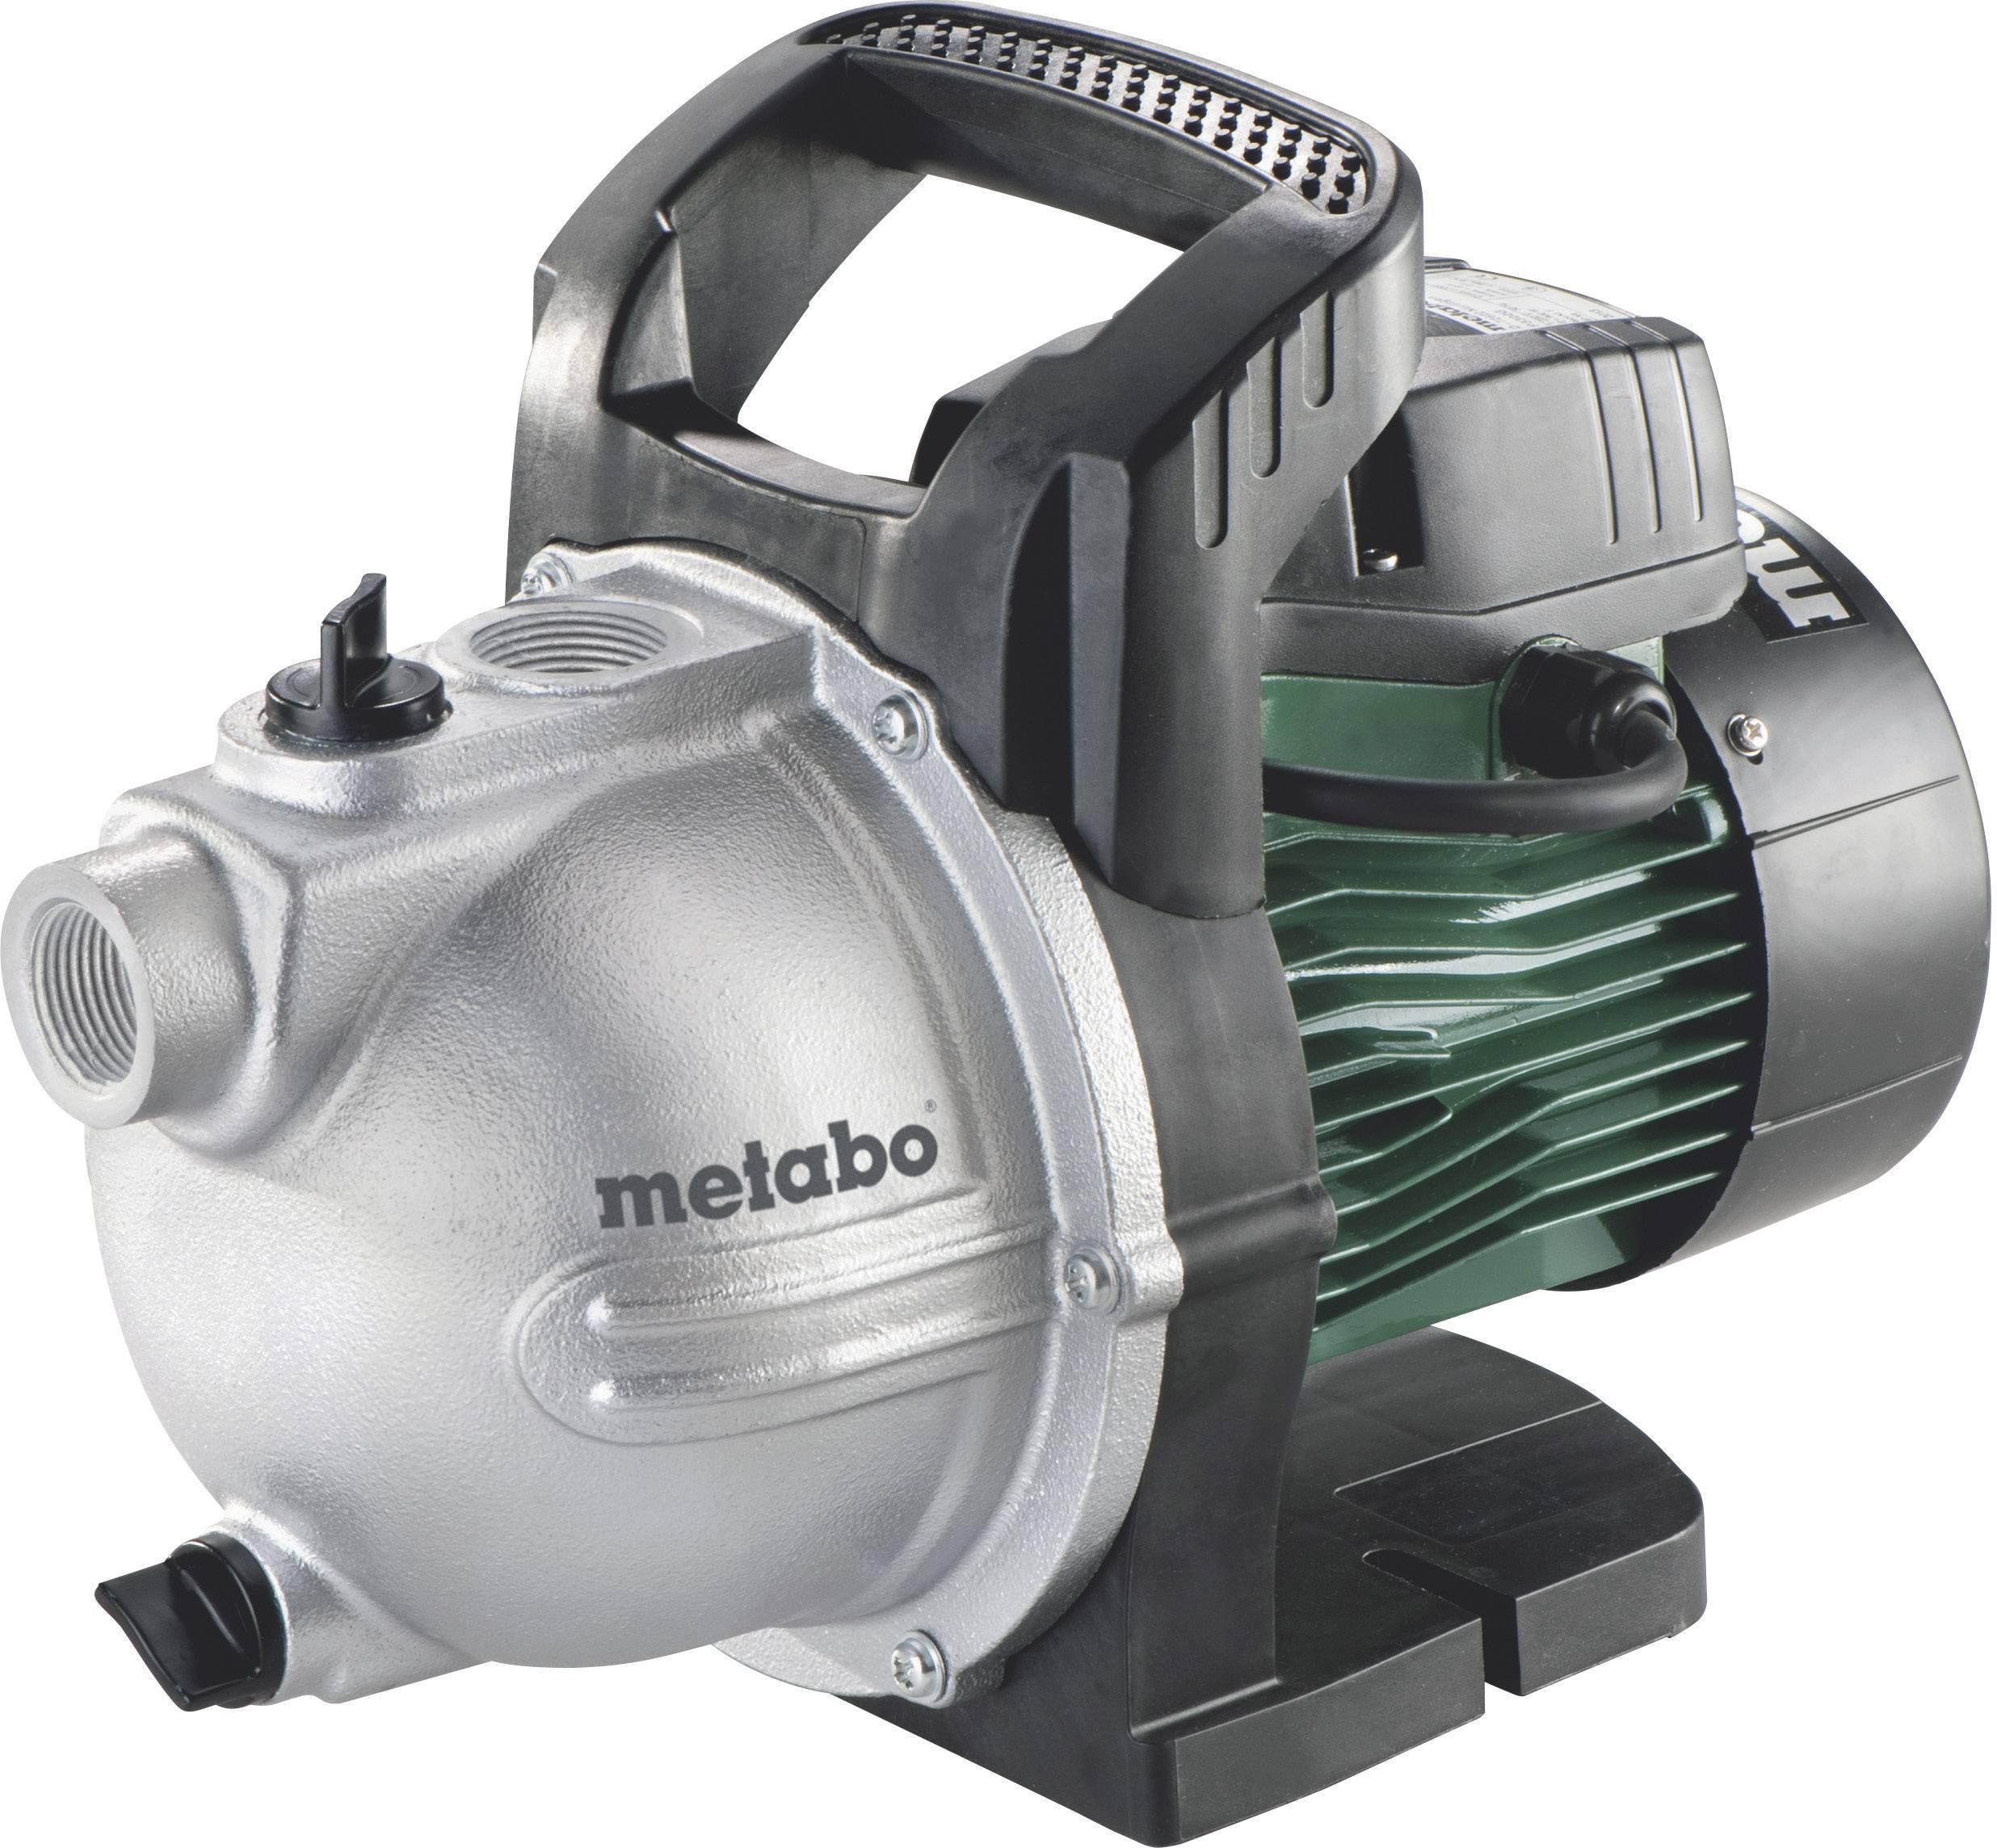 Záhradné čerpadlo Metabo P 4000 G 600964000, 4000 l/h, 46 m, 1100 W